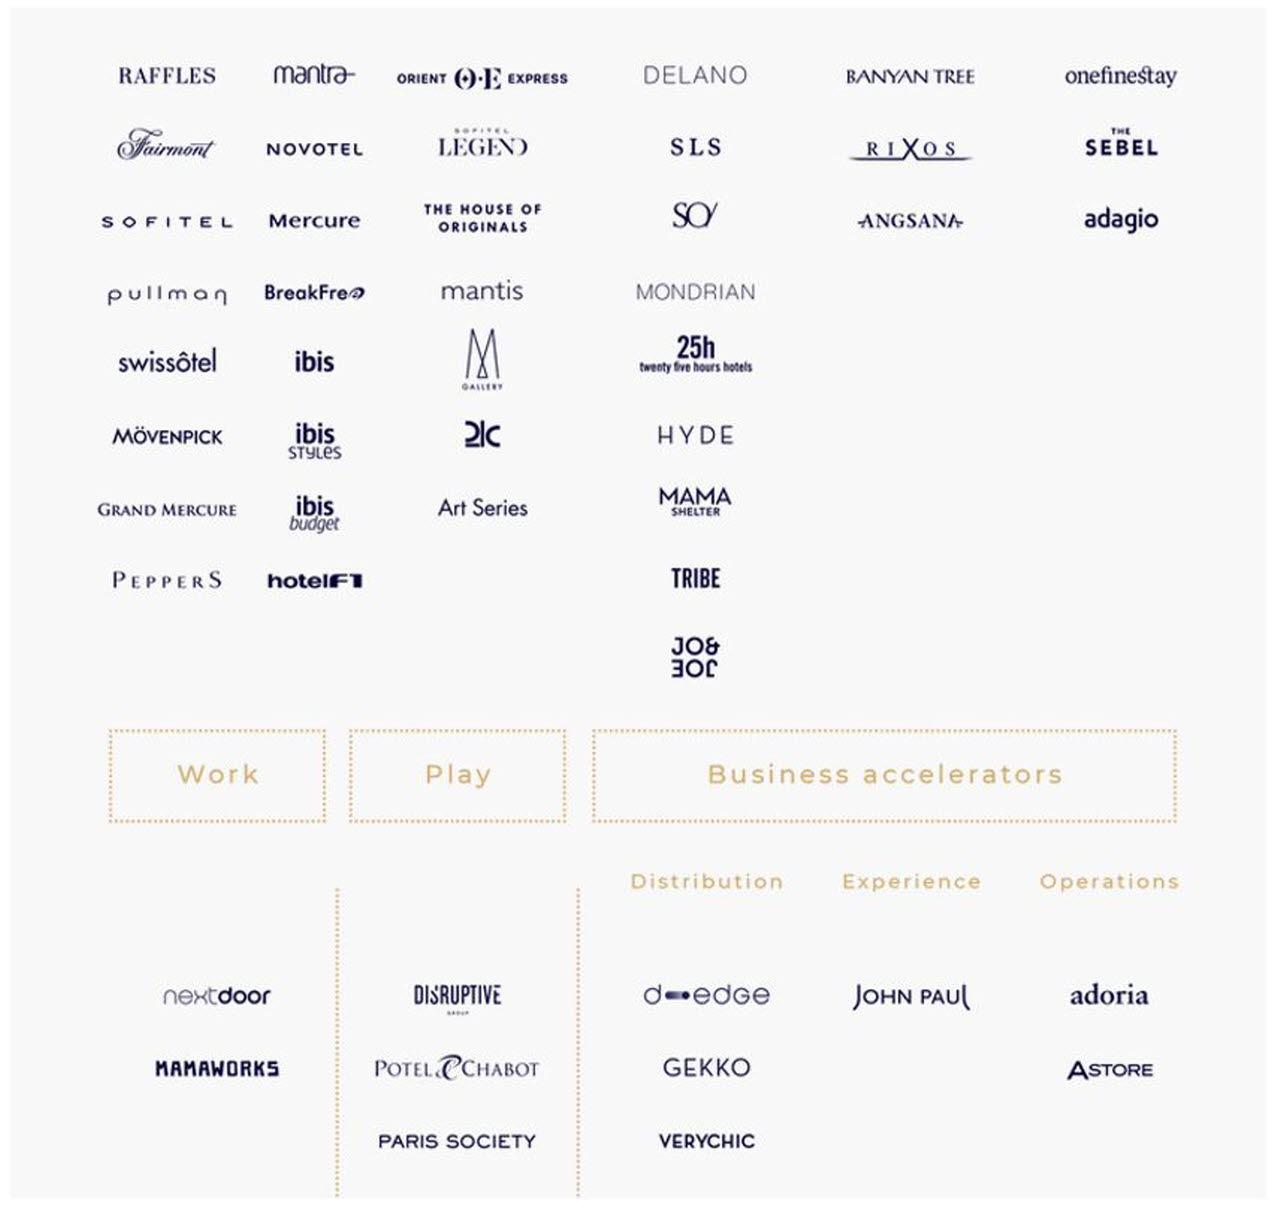 Accor Brand portfolio